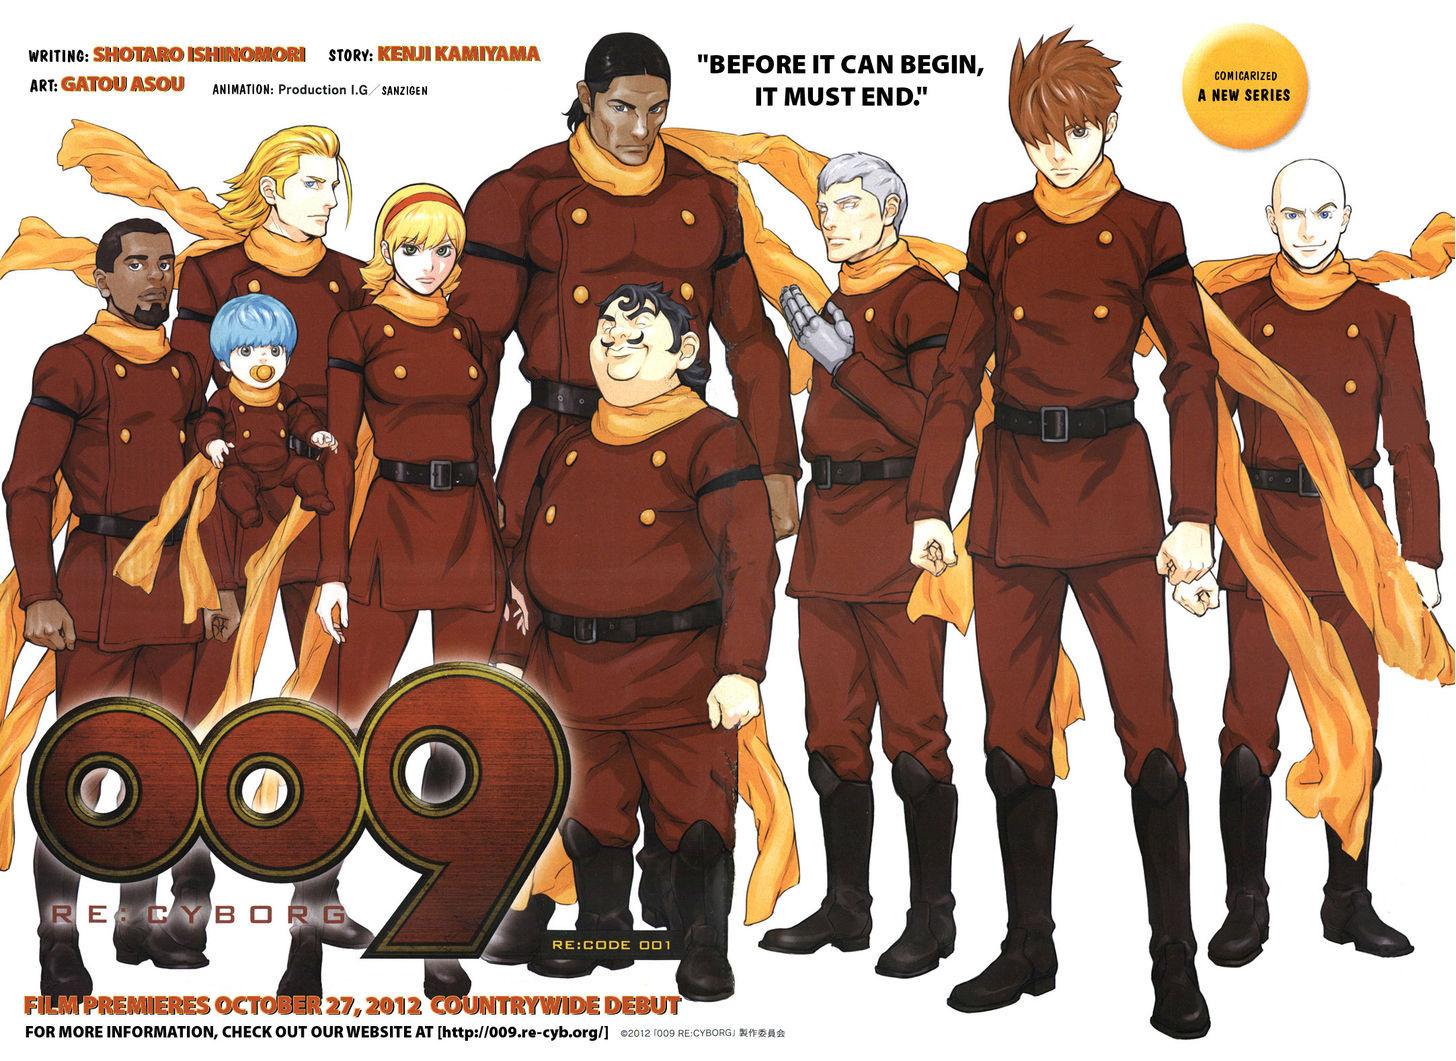 Orends: Range: Cyborg 009